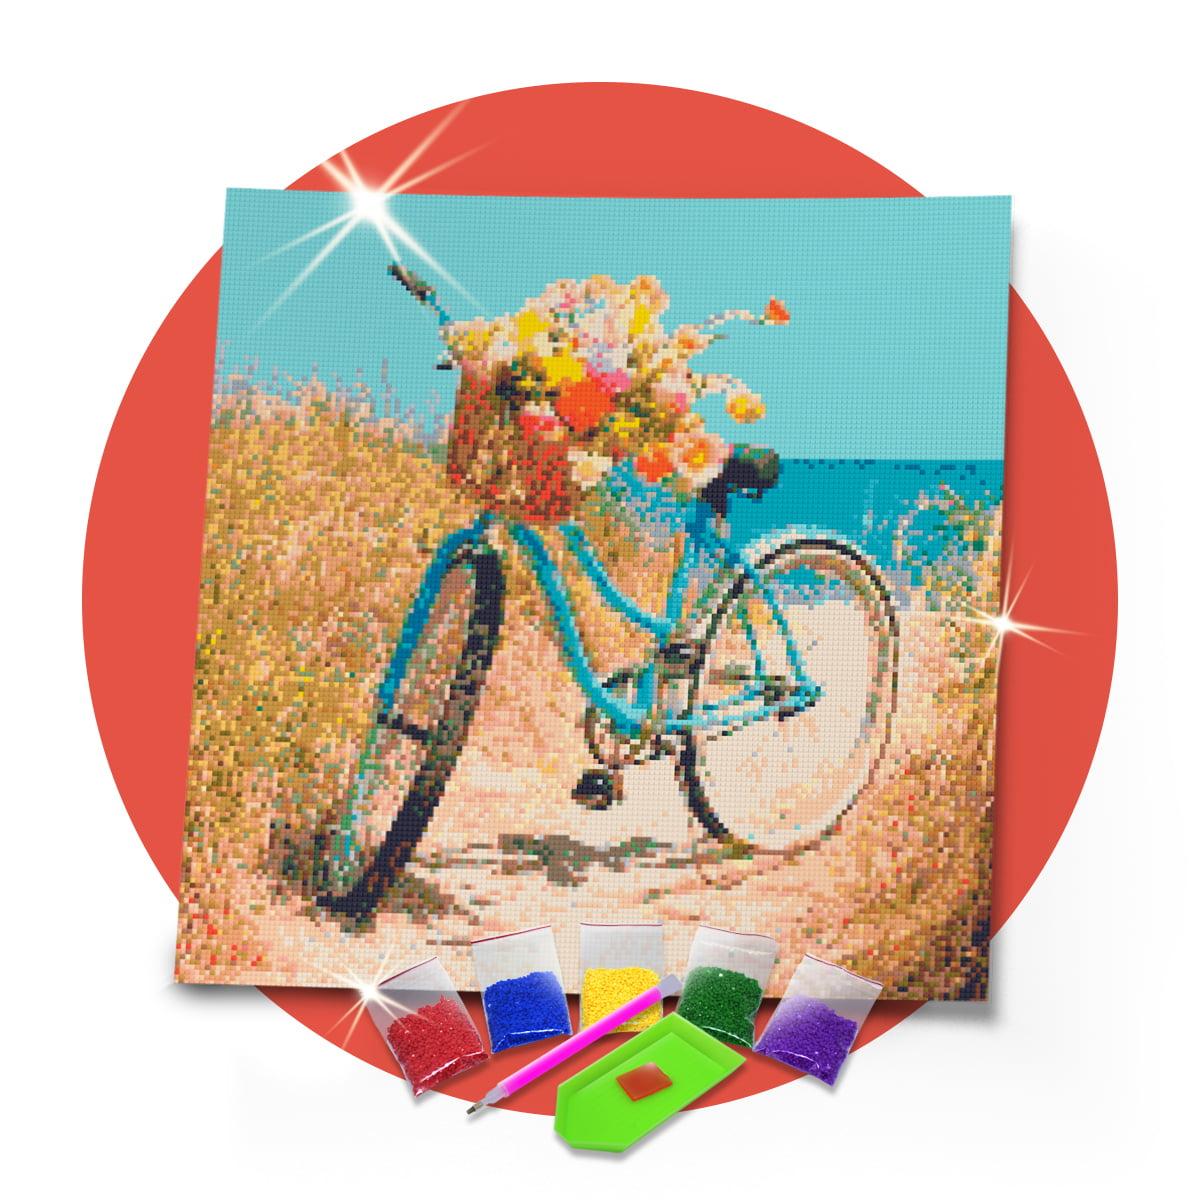 Kit Pintura com Diamantes | Tela Bicicleta na Praia - 45 x 45 cm - Diamante Redondo | Diamond Painting 5D DIY